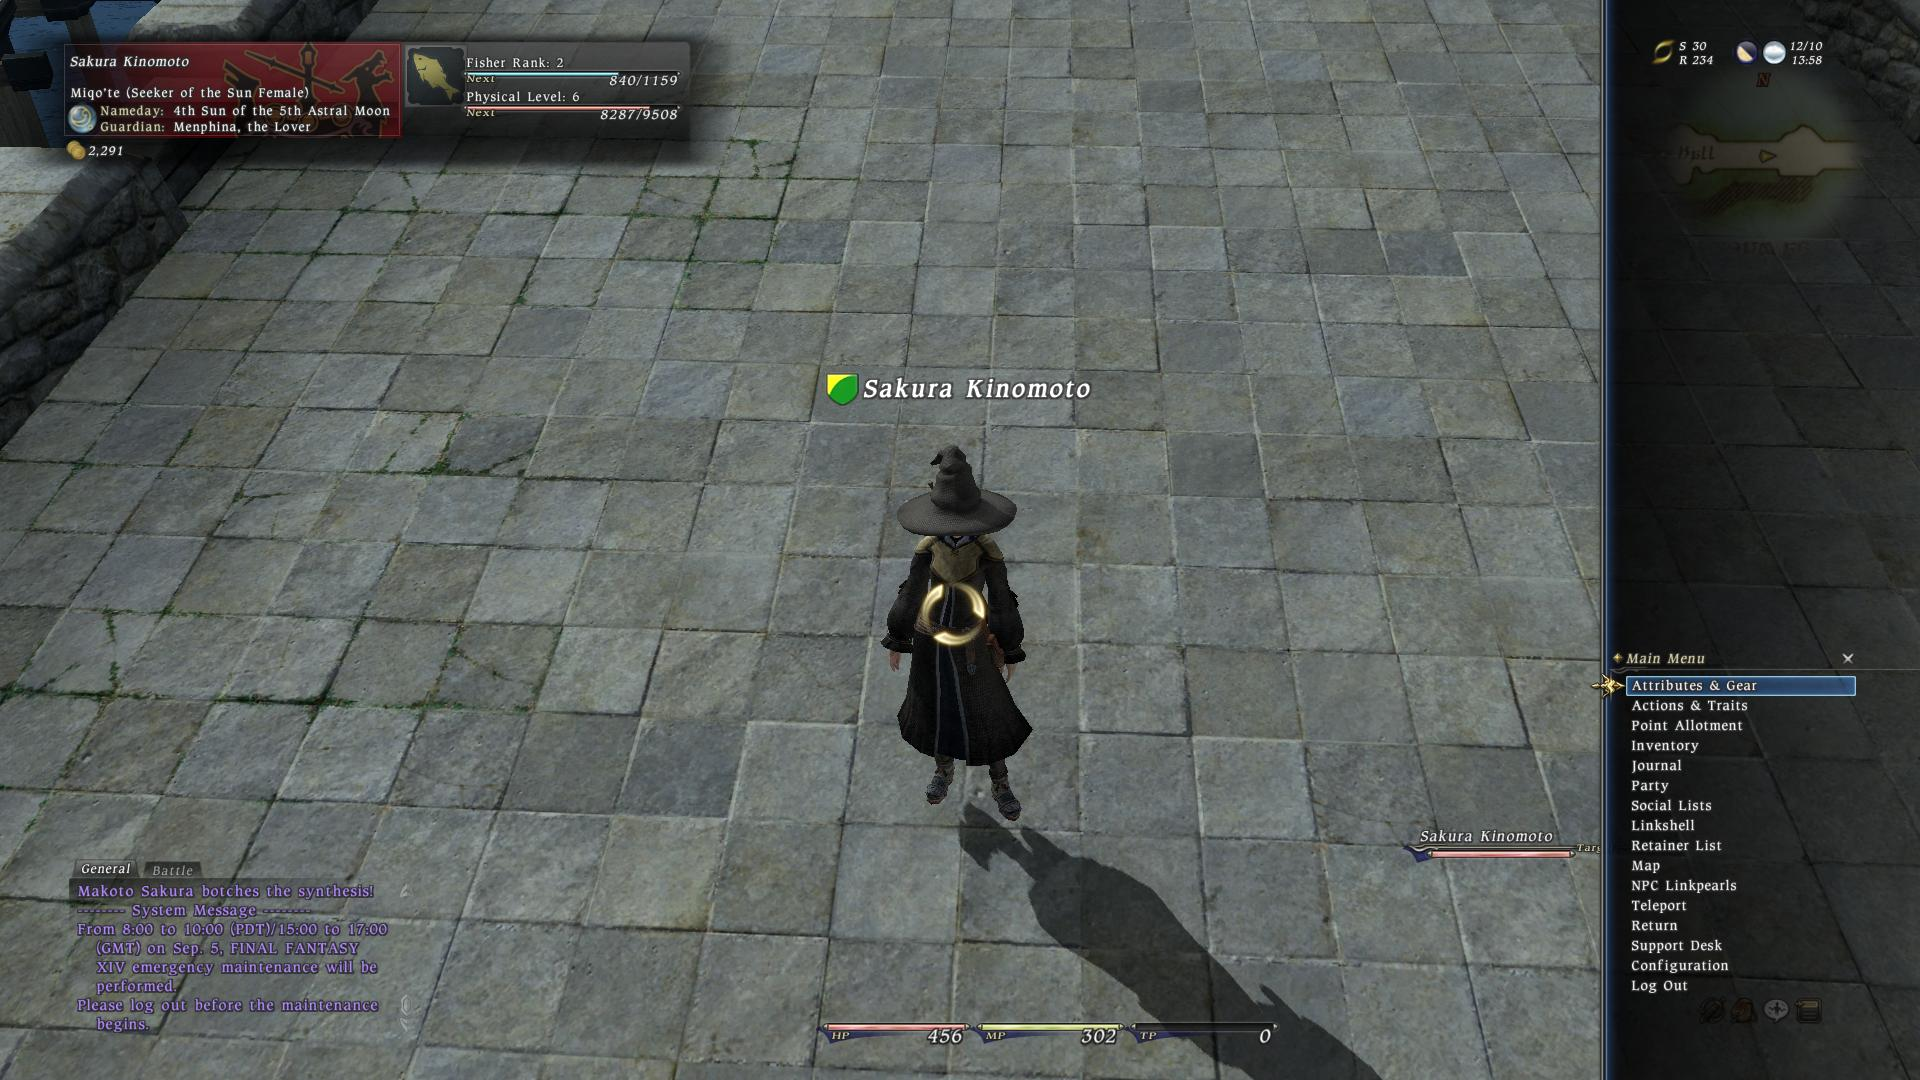 Final Fantasy XIV Player Digest #2 – Saku's Thoughts